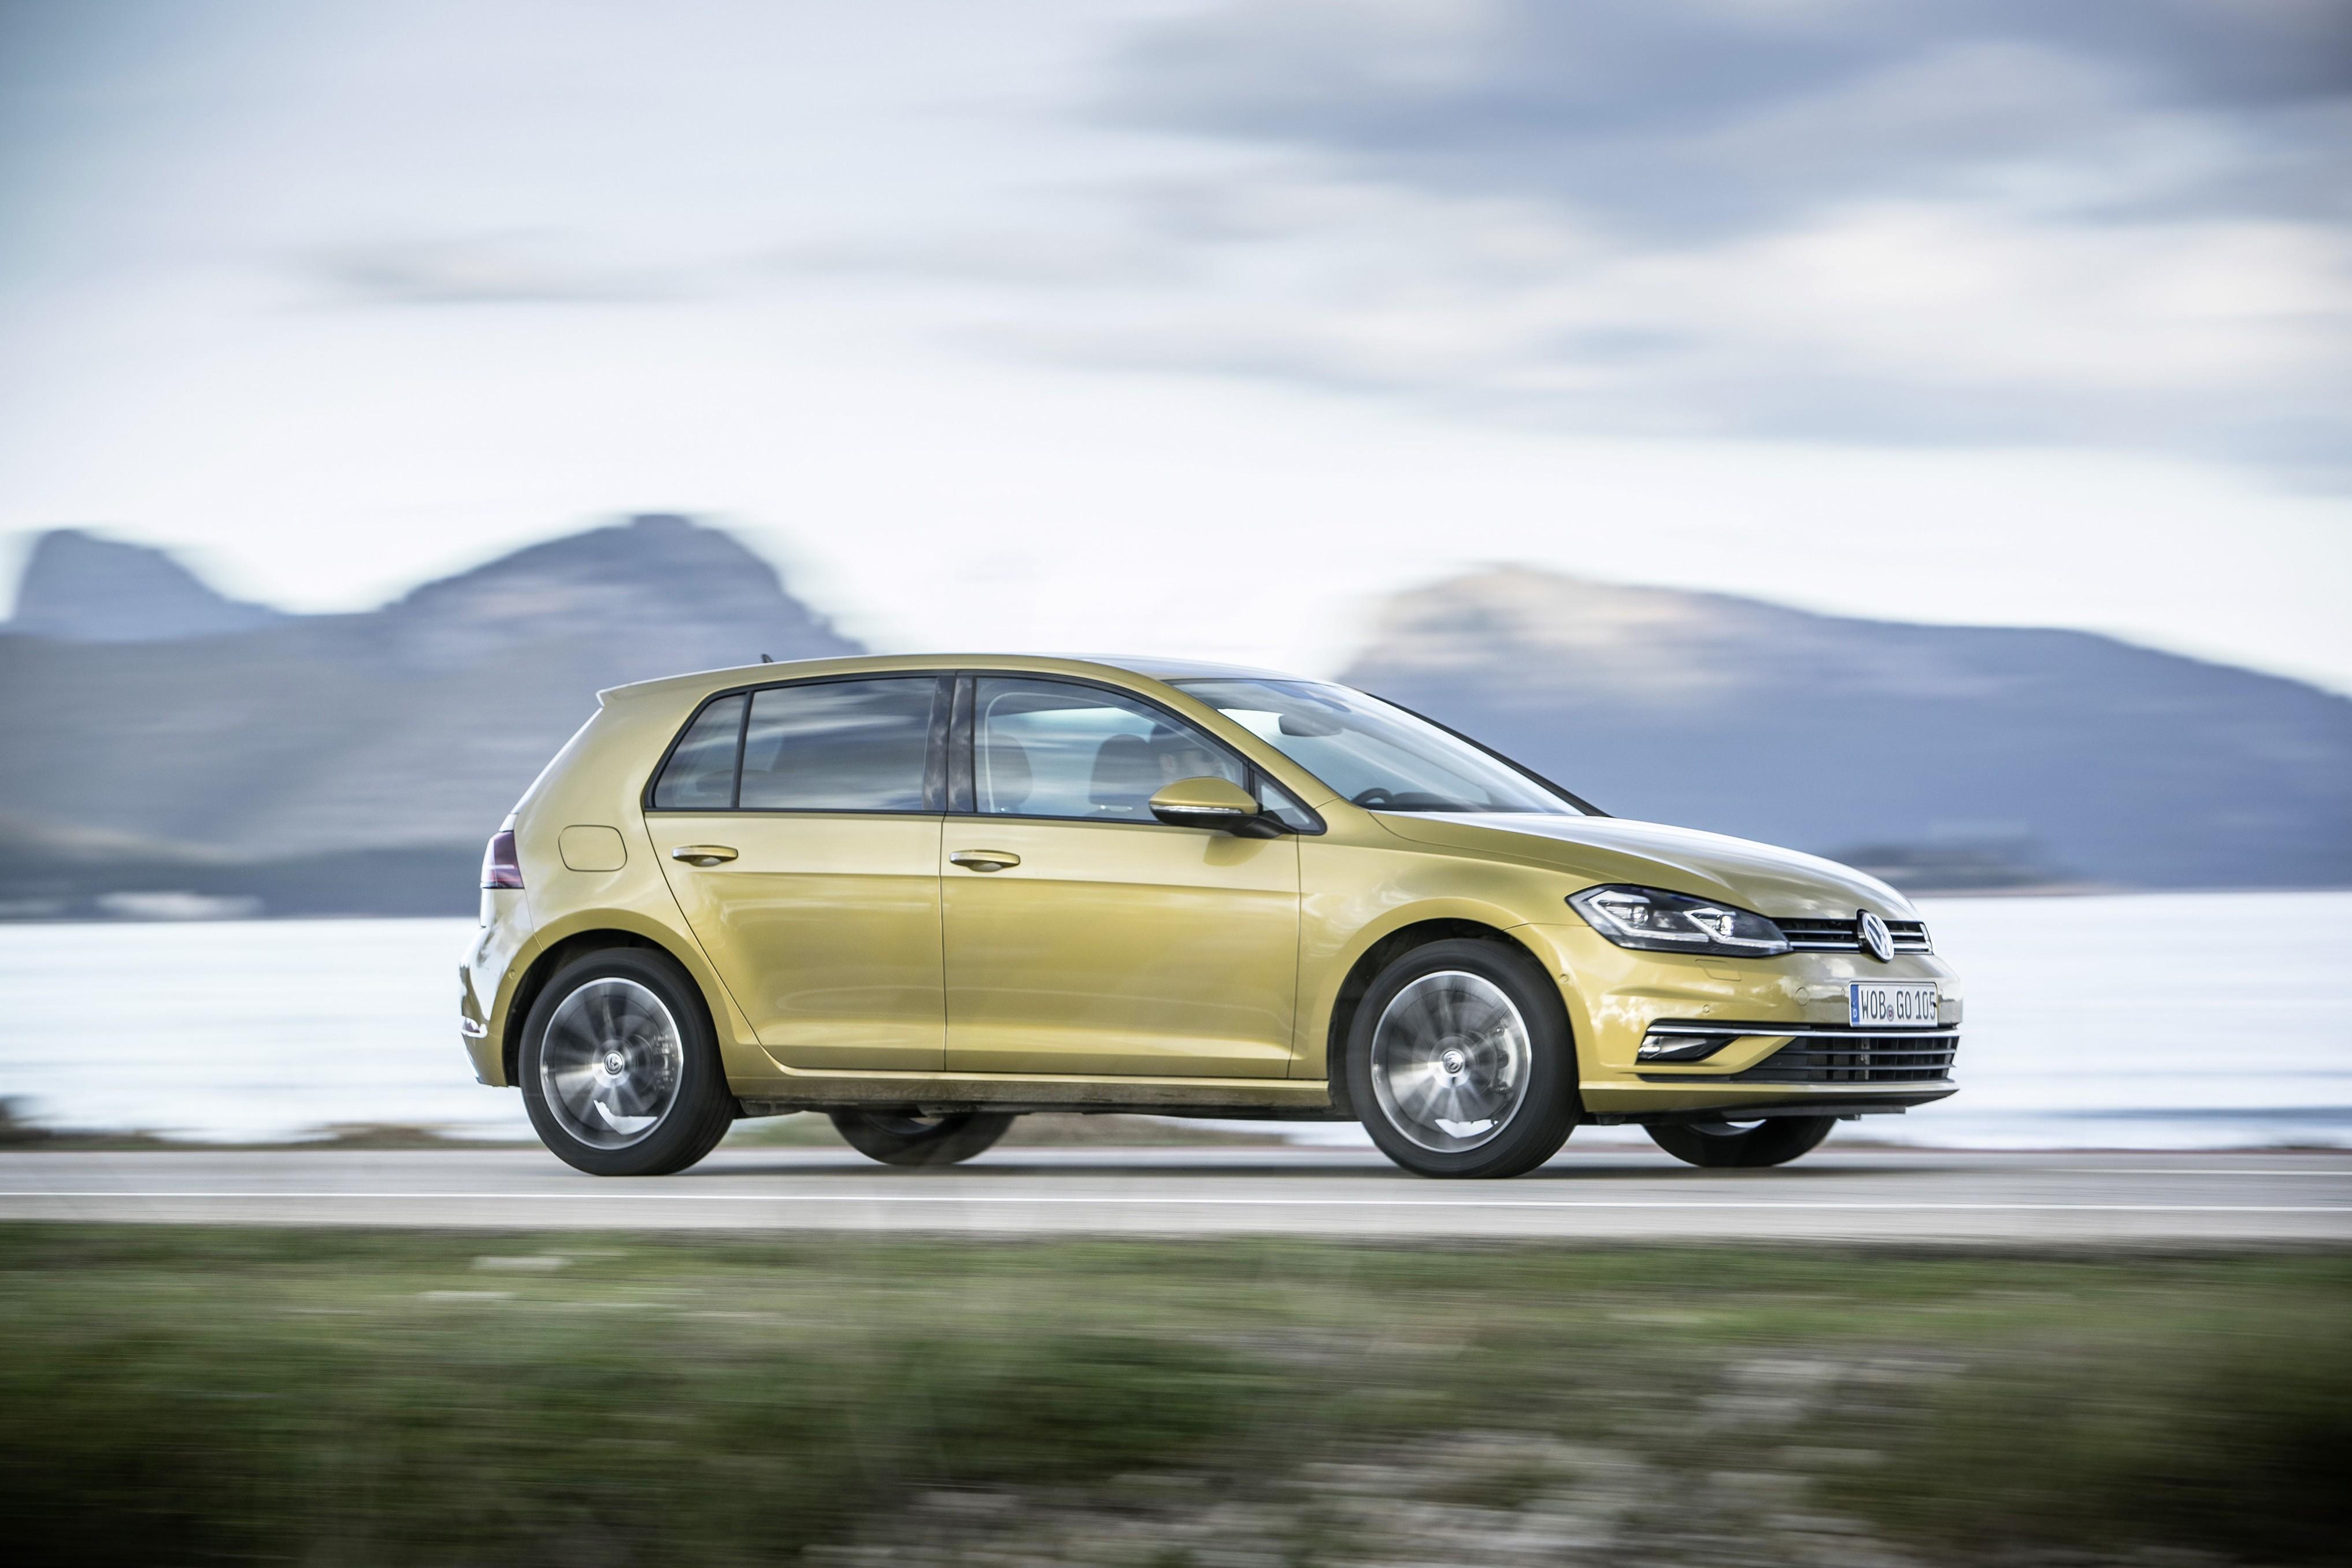 Golf Pictures: 2019 Volkswagen Golf 8 Teased At Supplier Summit In